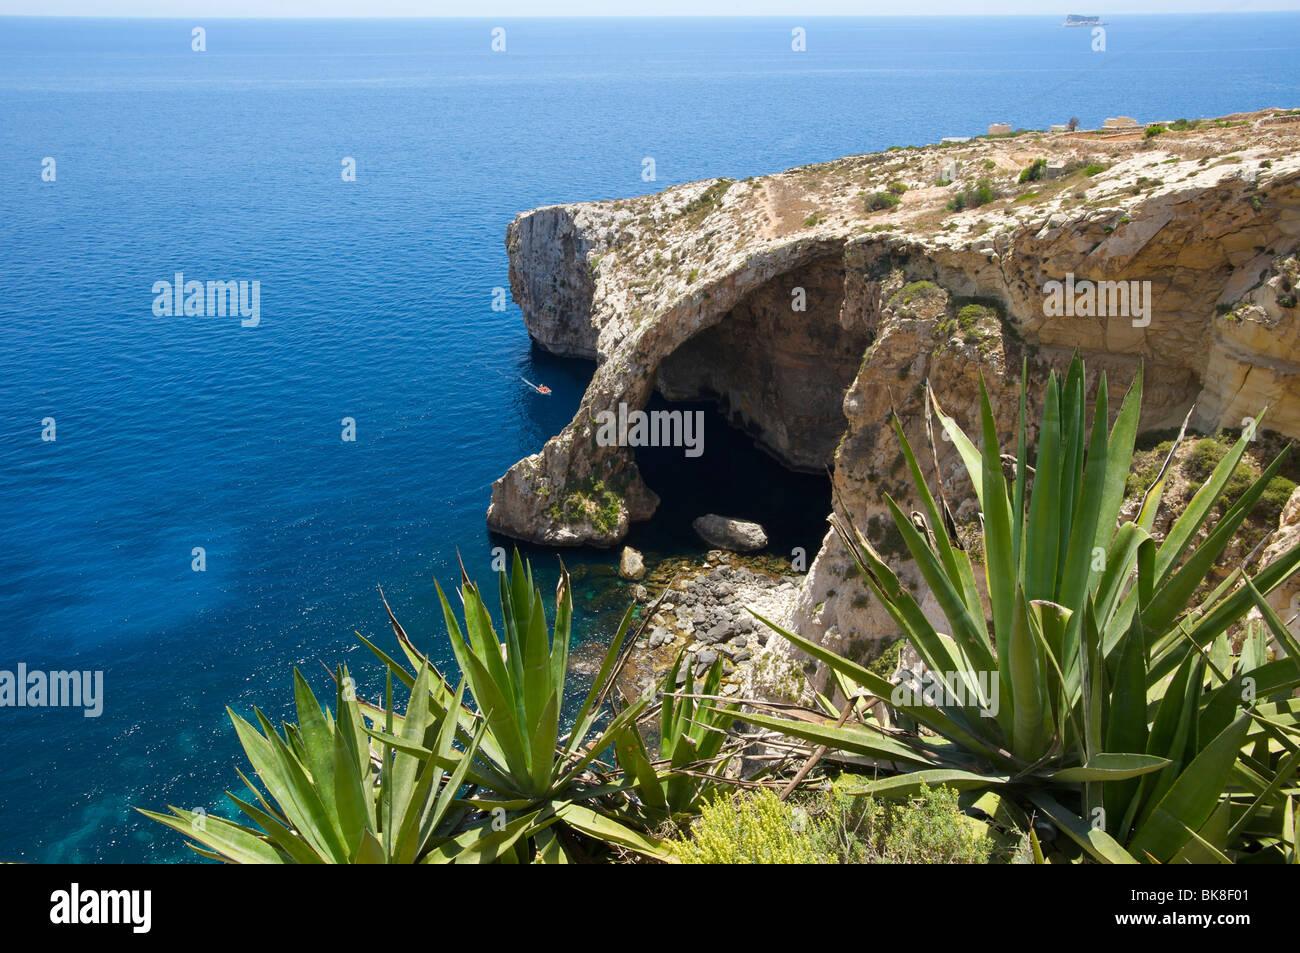 Blue Grotto in Malta, Europe - Stock Image